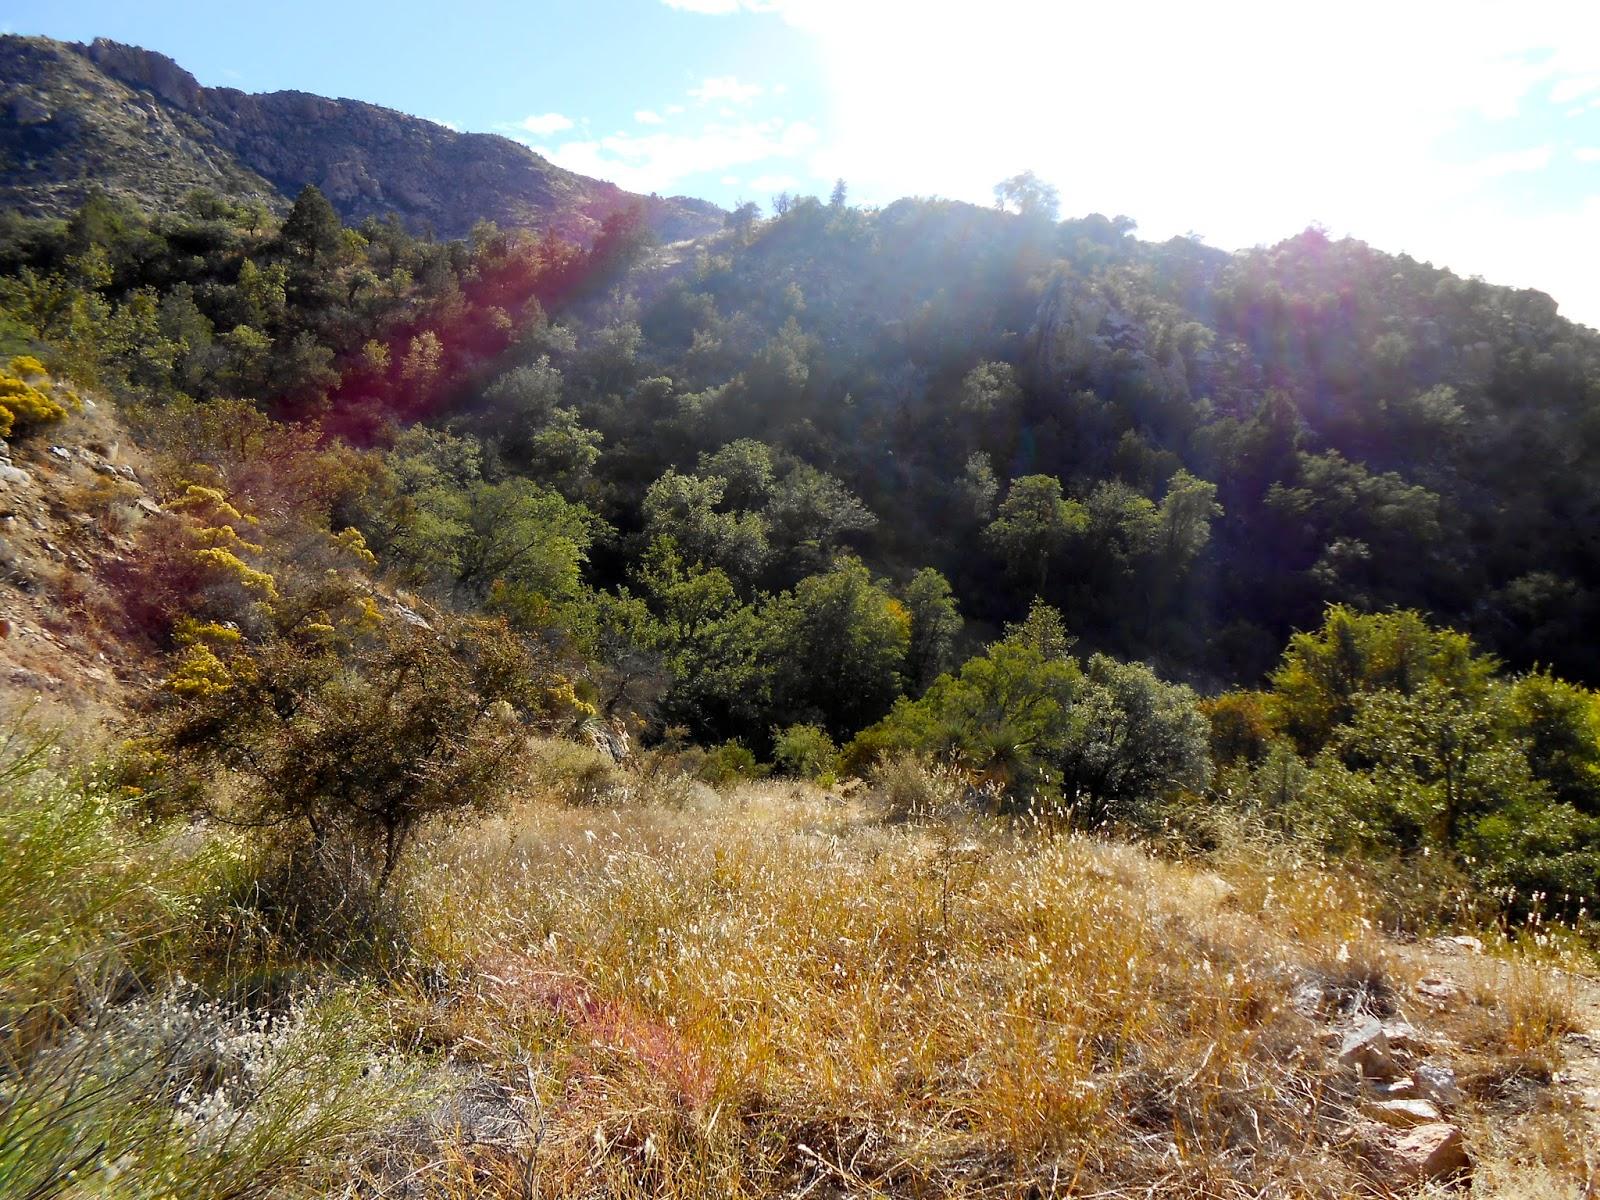 sycamore reservoir trail catalina mountains tucson arizona